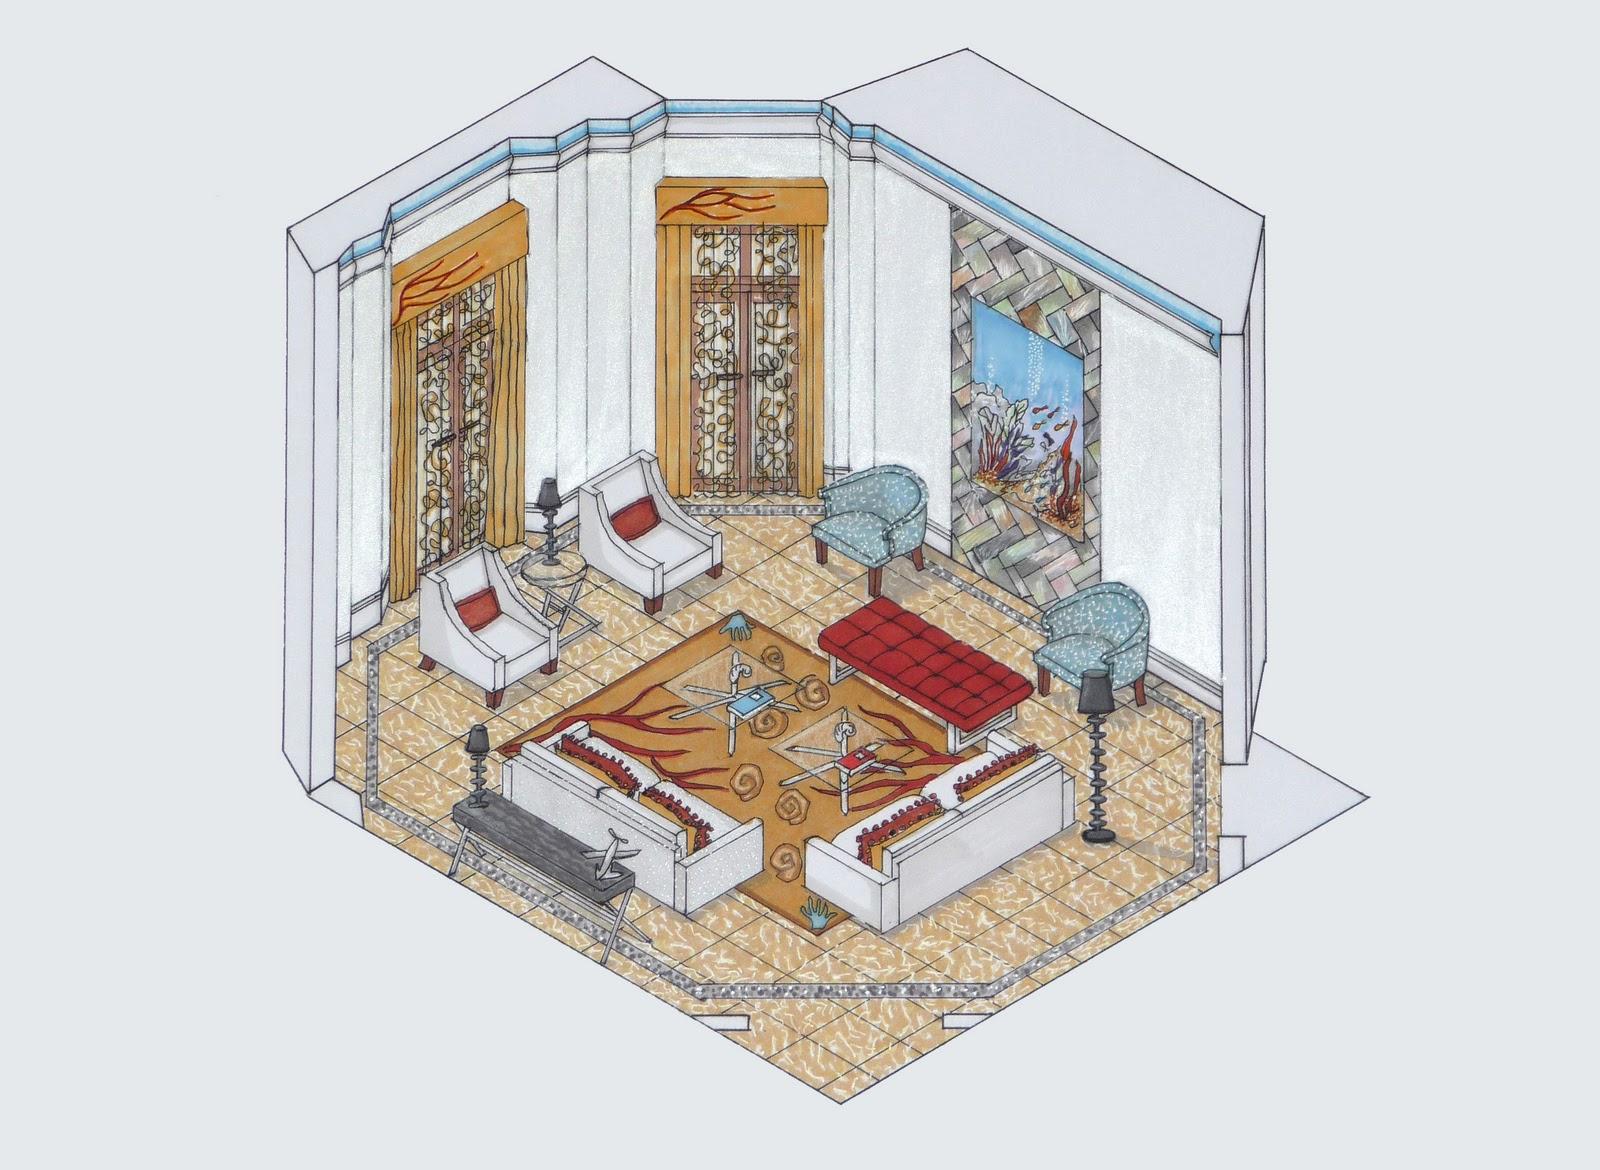 House Isometric View Joy Studio Design Gallery Best Design